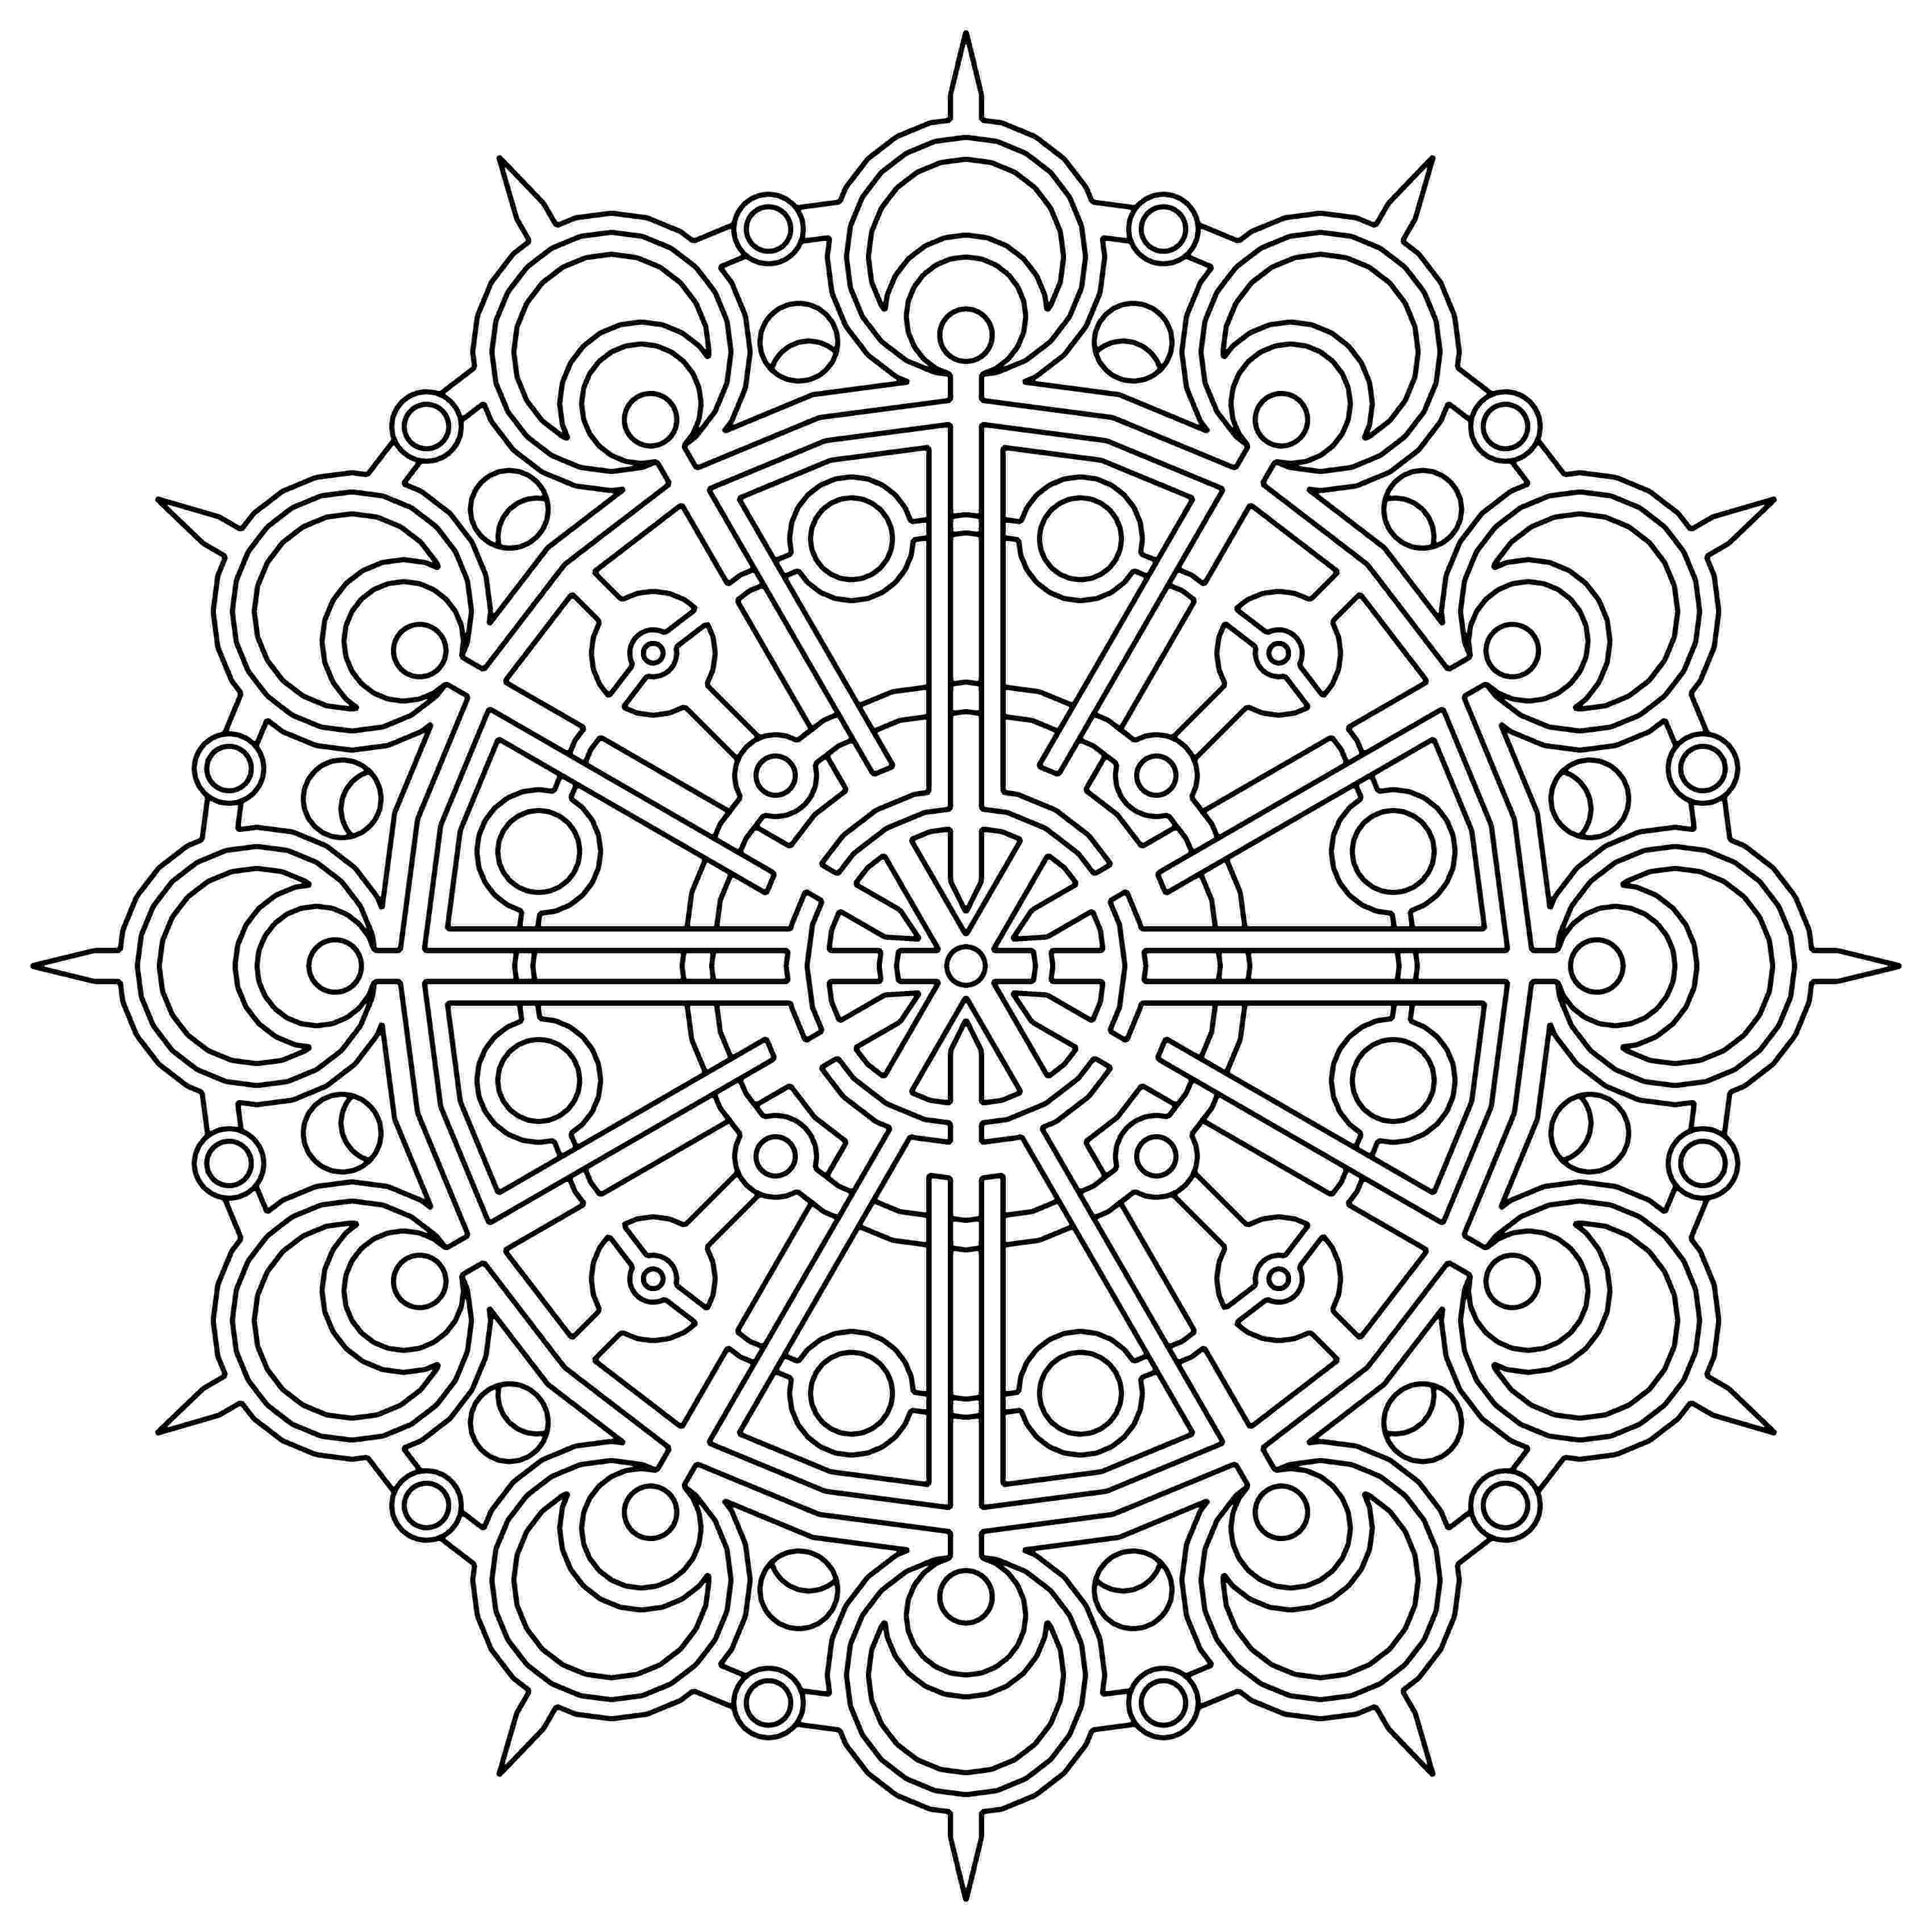 printable coloring designs flowers paisley design coloring pages hellokidscom coloring designs printable